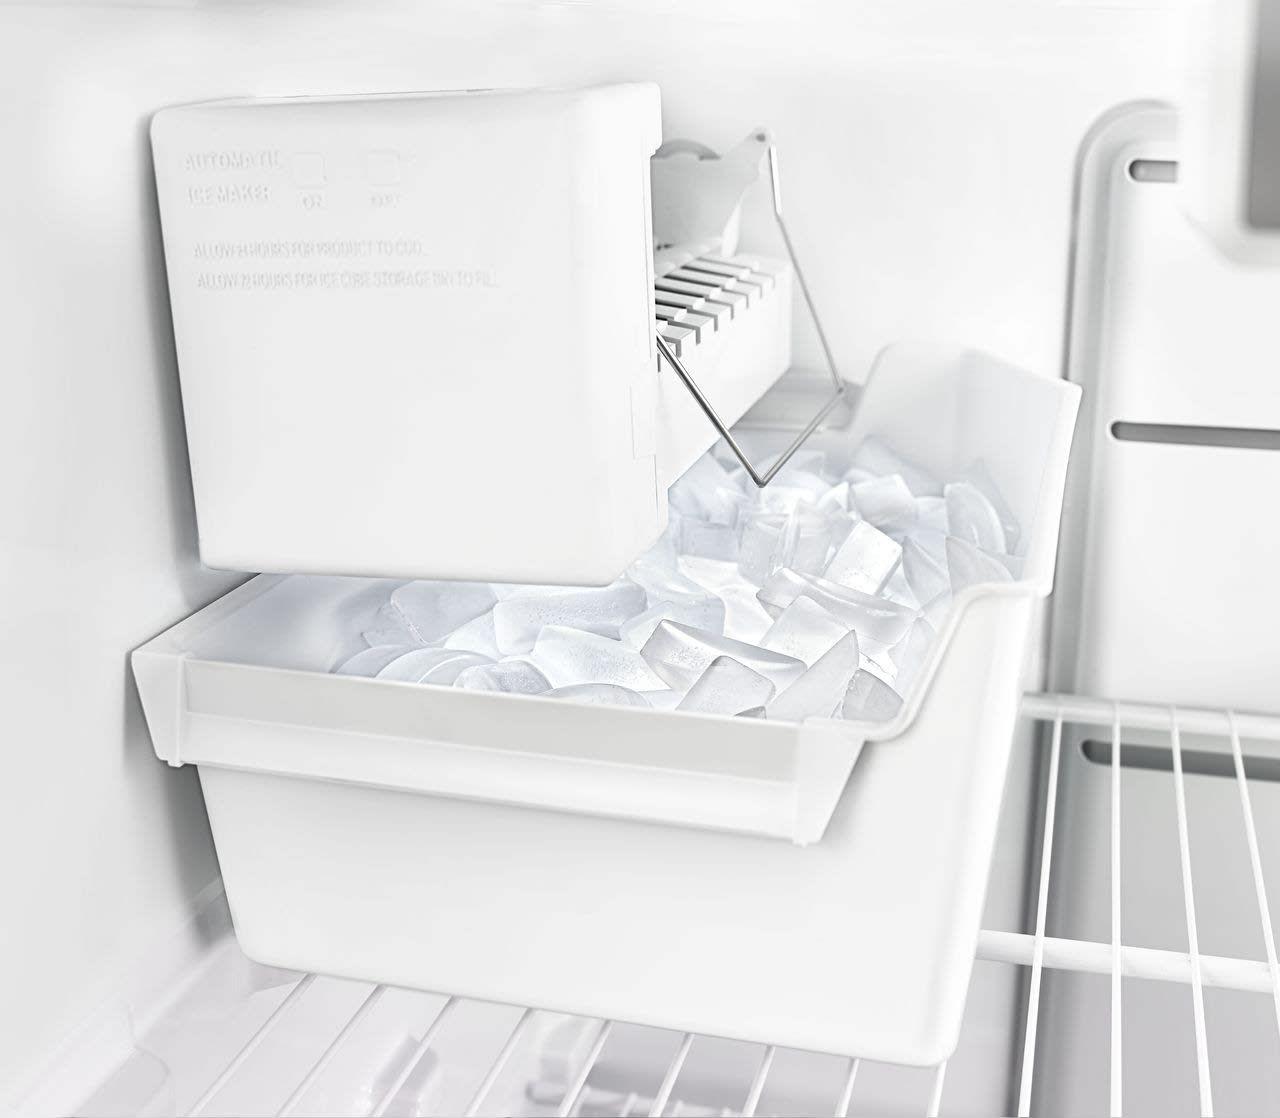 Whirlpool Sidekicks WHREFR1 Upright freezer